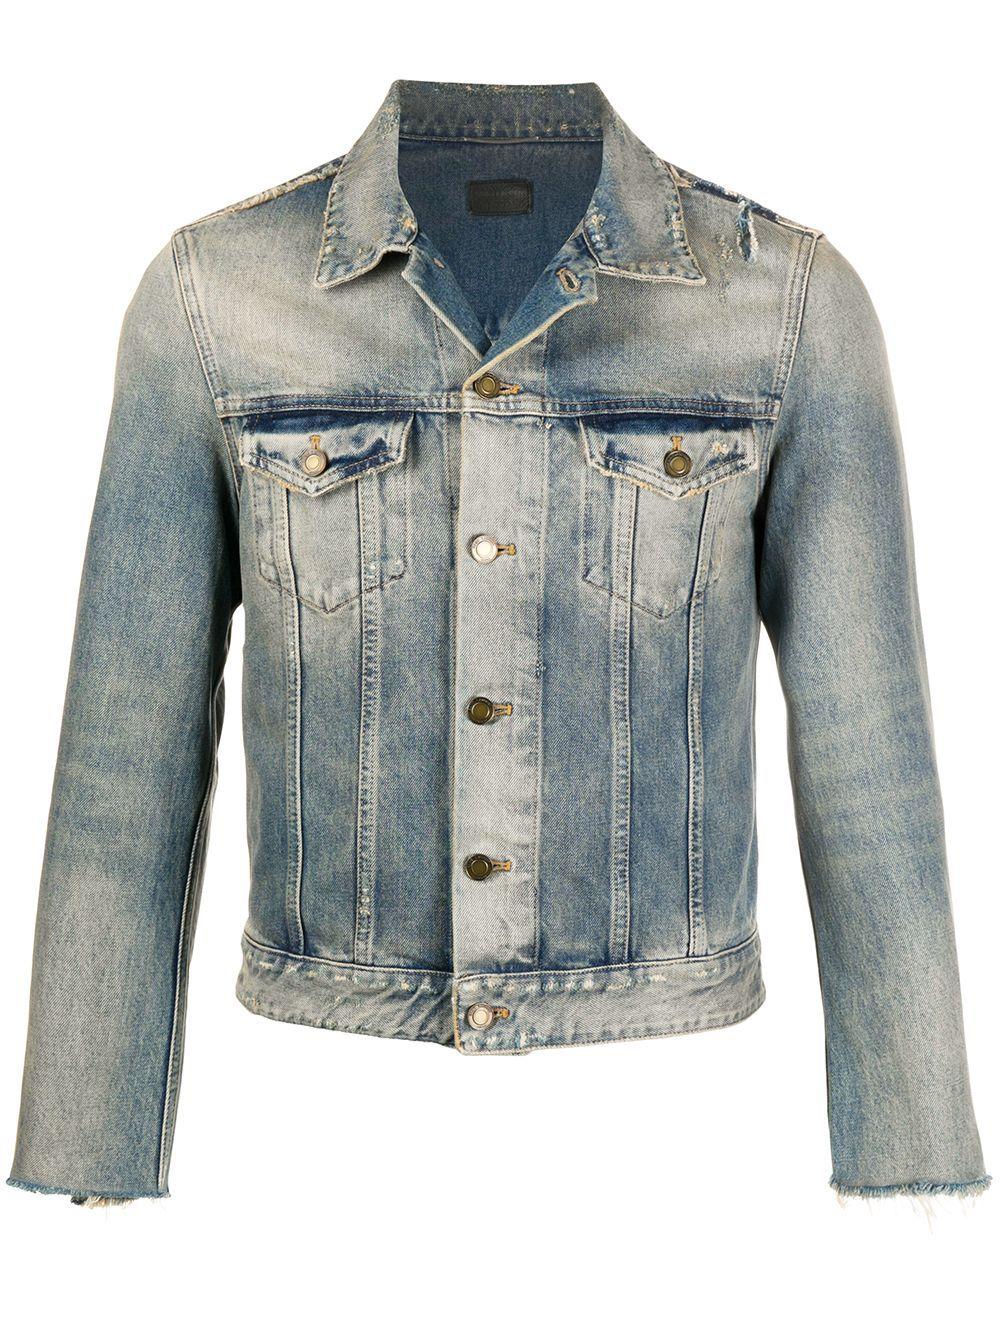 Saint Laurent Stonewashed Effect Denim Jacket Blue In 2021 Denim Jacket Saint Laurent Menswear Denim Jacket Men [ 1334 x 1000 Pixel ]